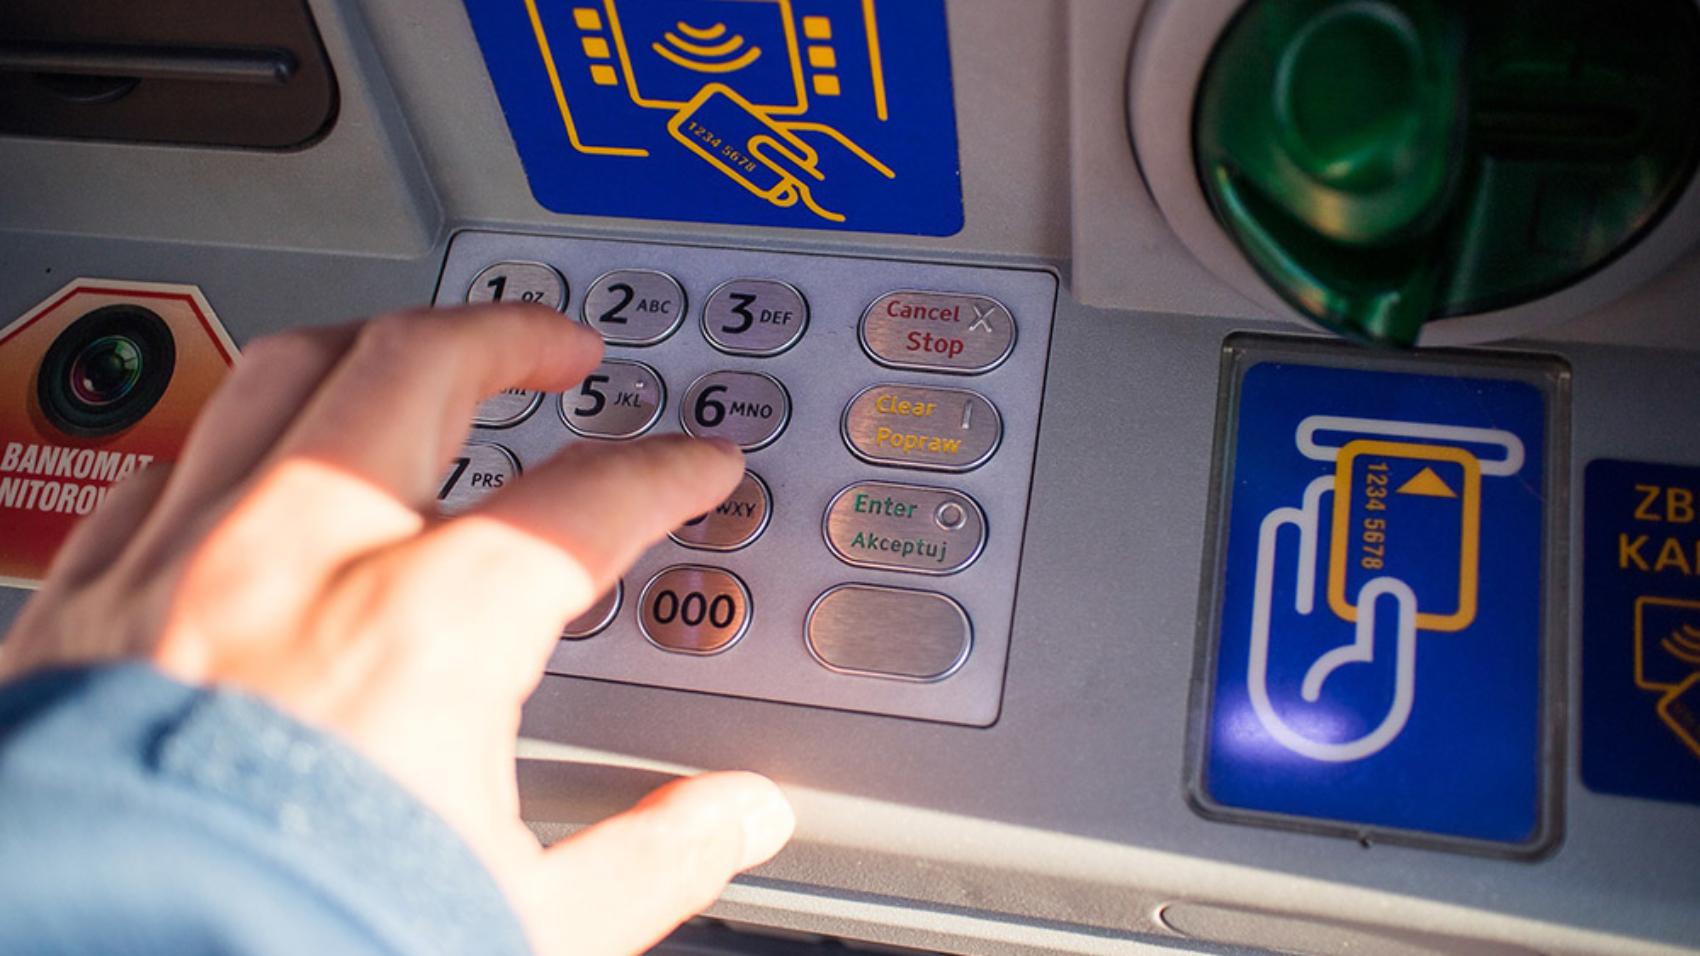 ATM Rome